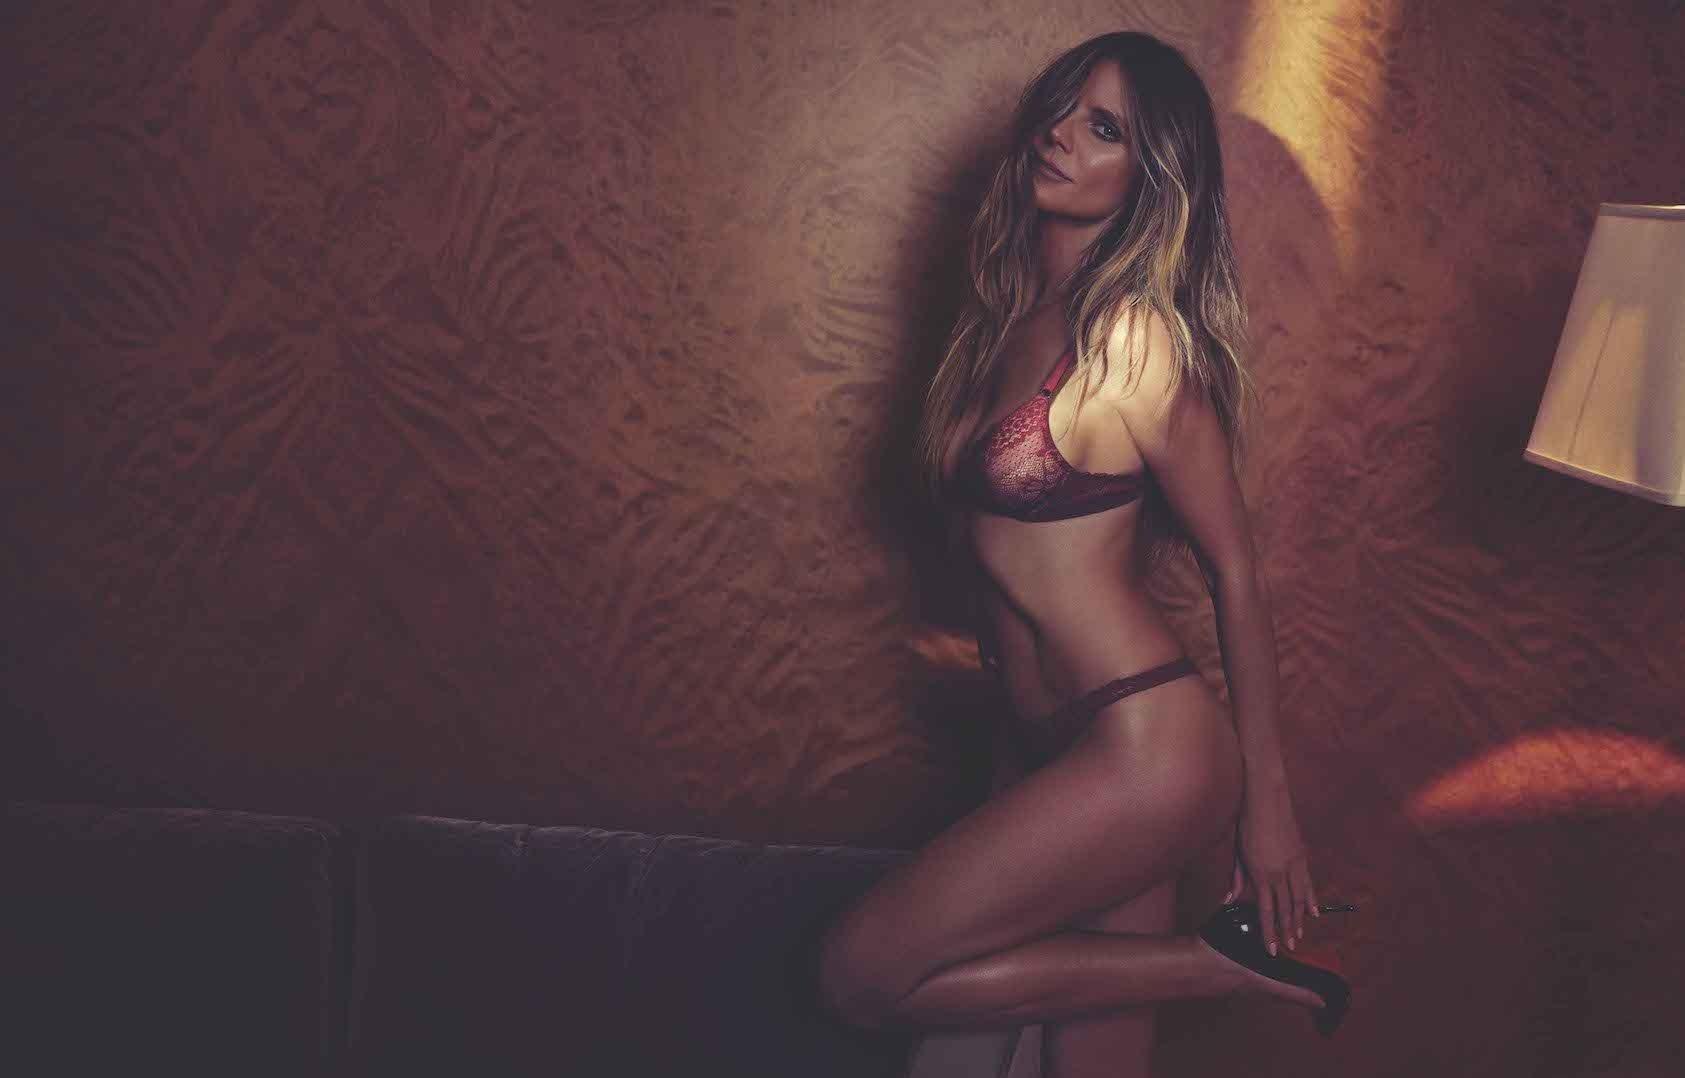 Heidi Klum posts nude photo of herself relaxing on